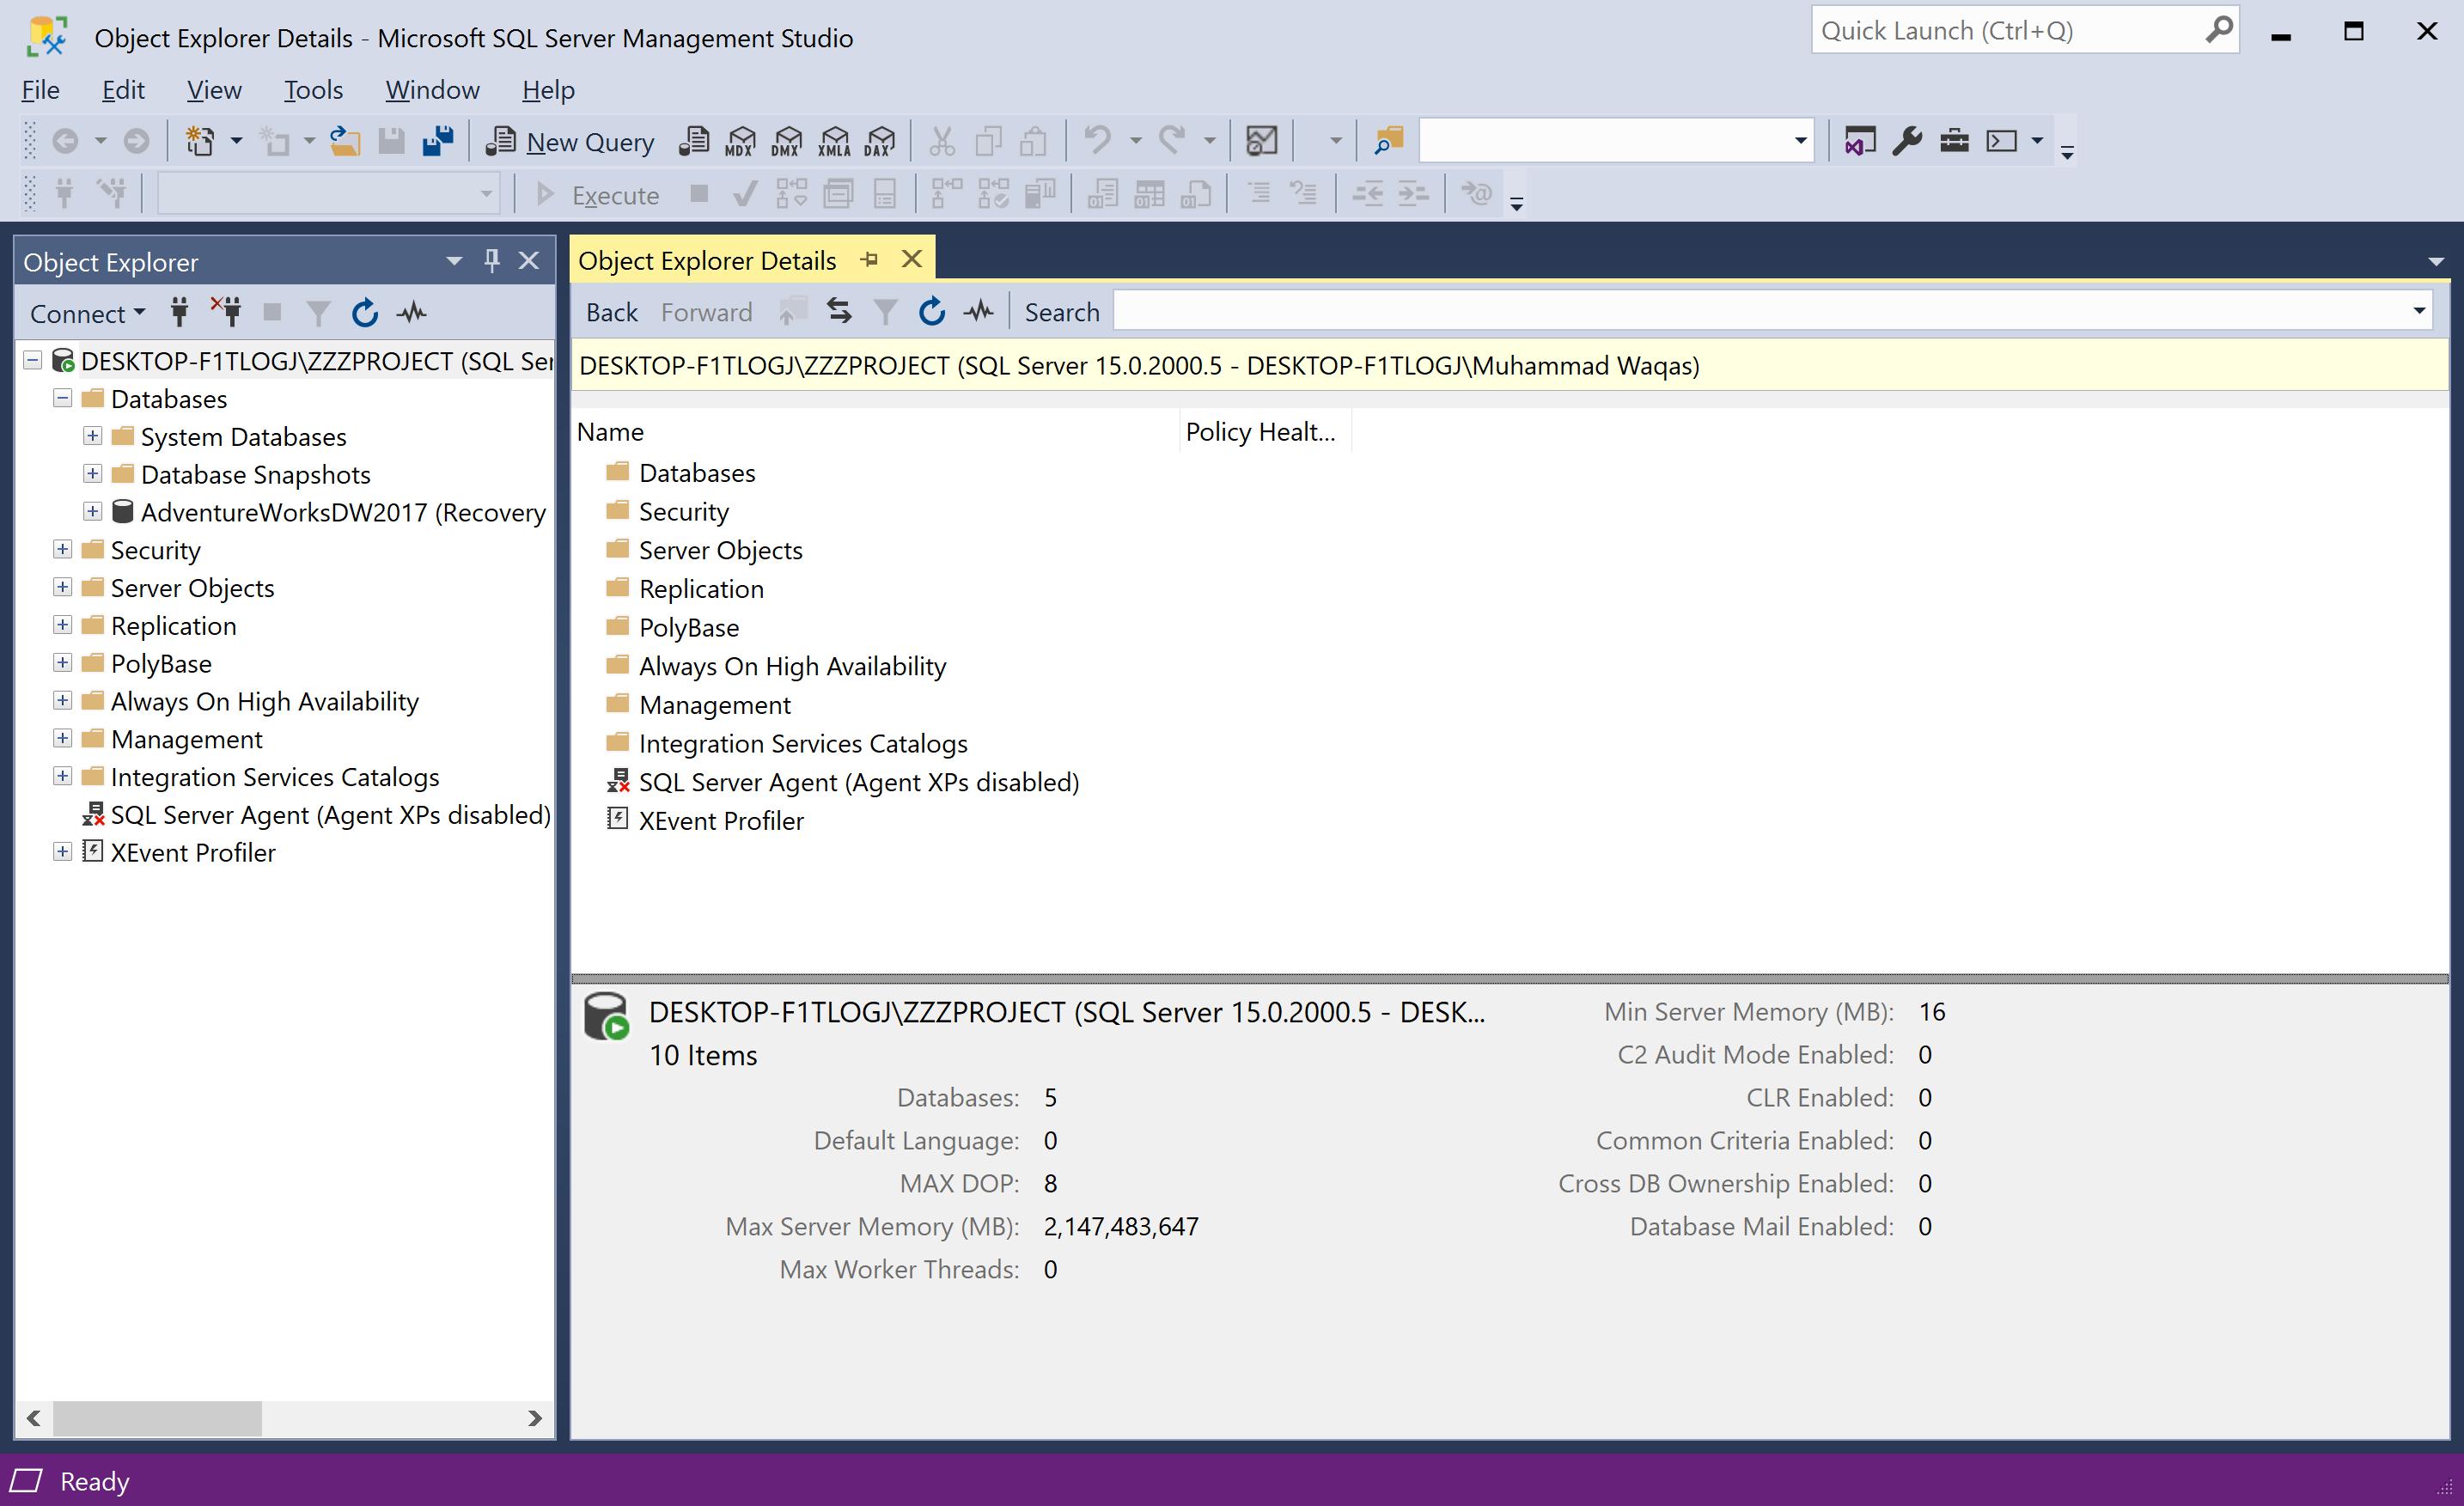 Object Explorer Details pane